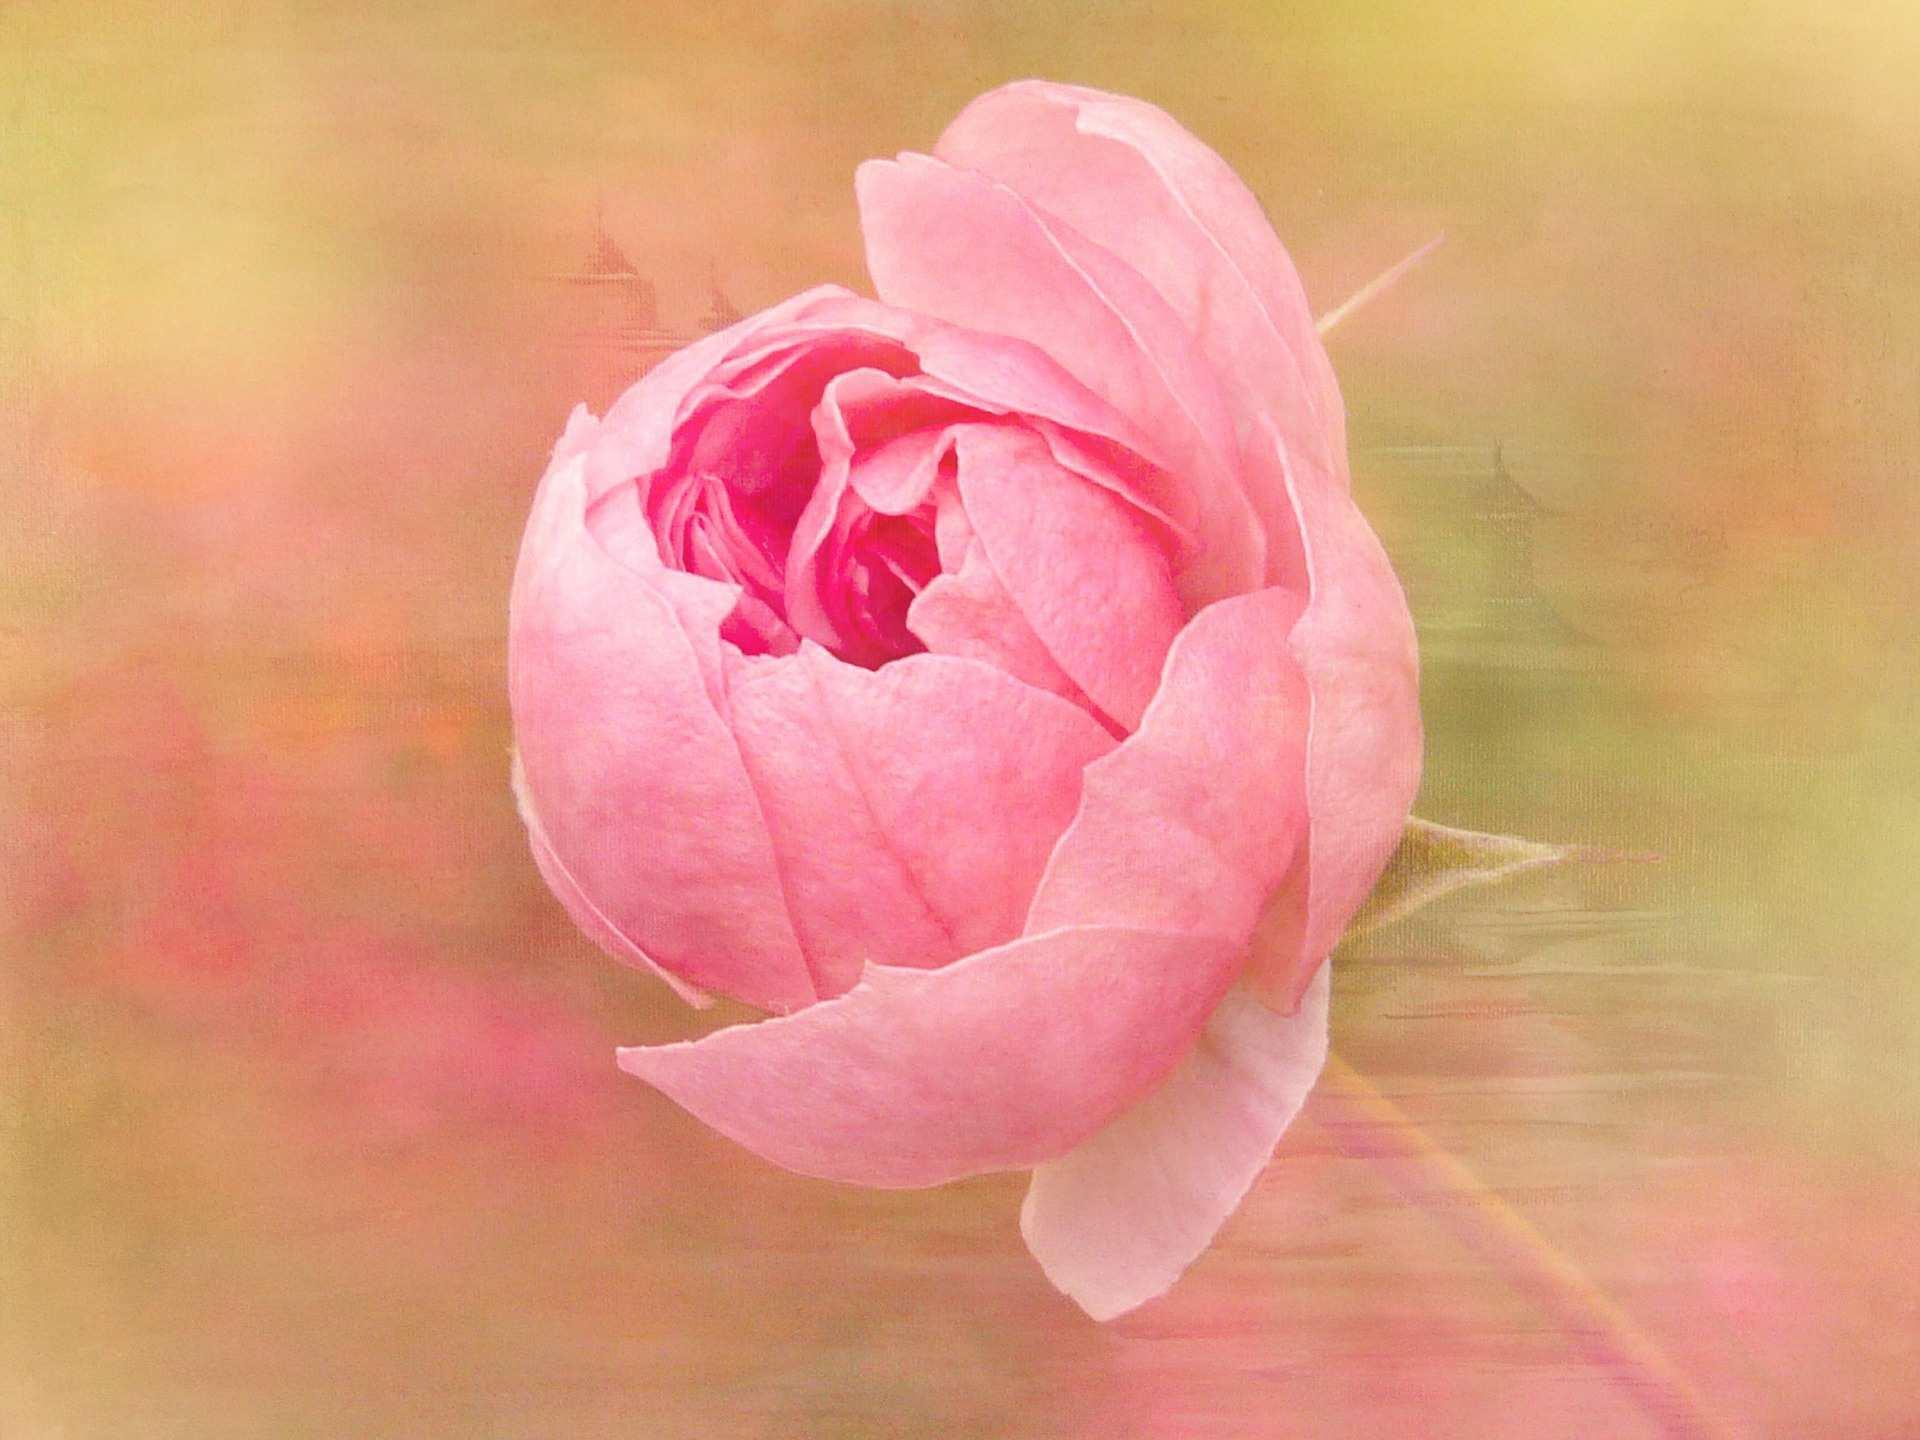 Contoh Lukisan Bunga Mawar Indah  Jual Poster di Juragan